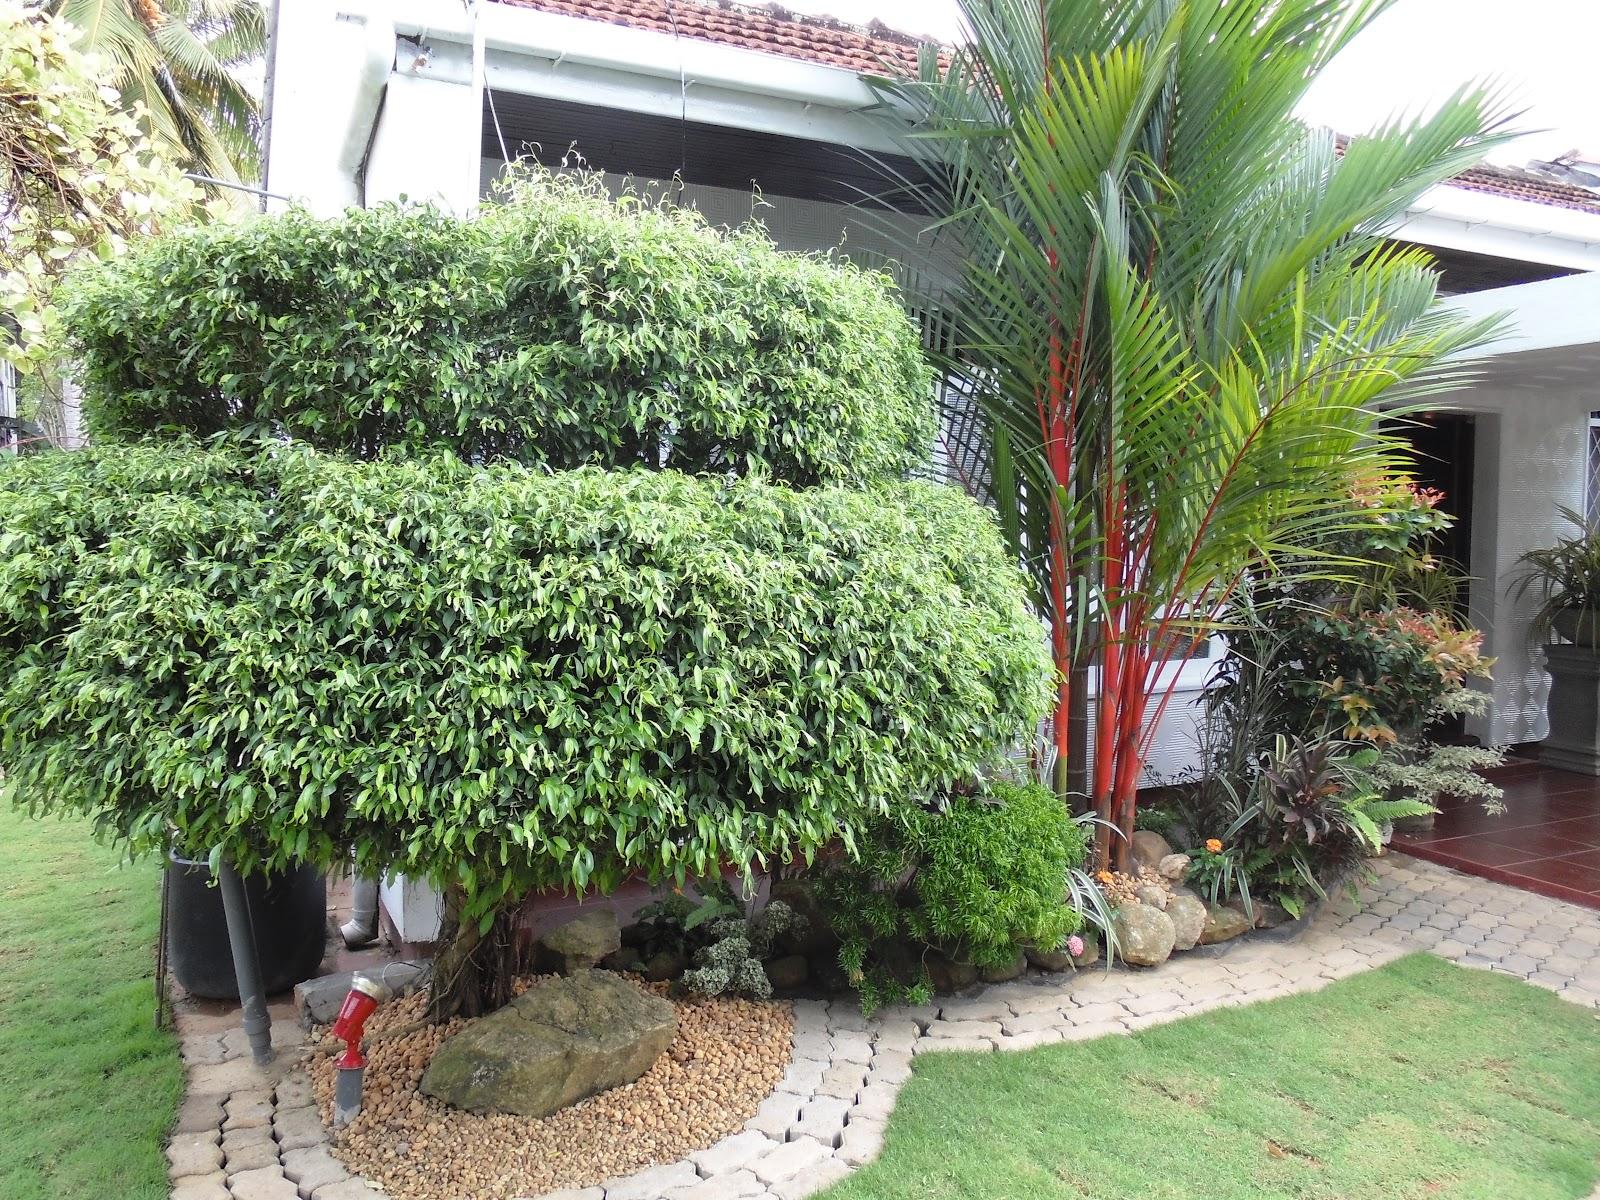 Lassana midula garden service lassana midula garden service for Gardening services